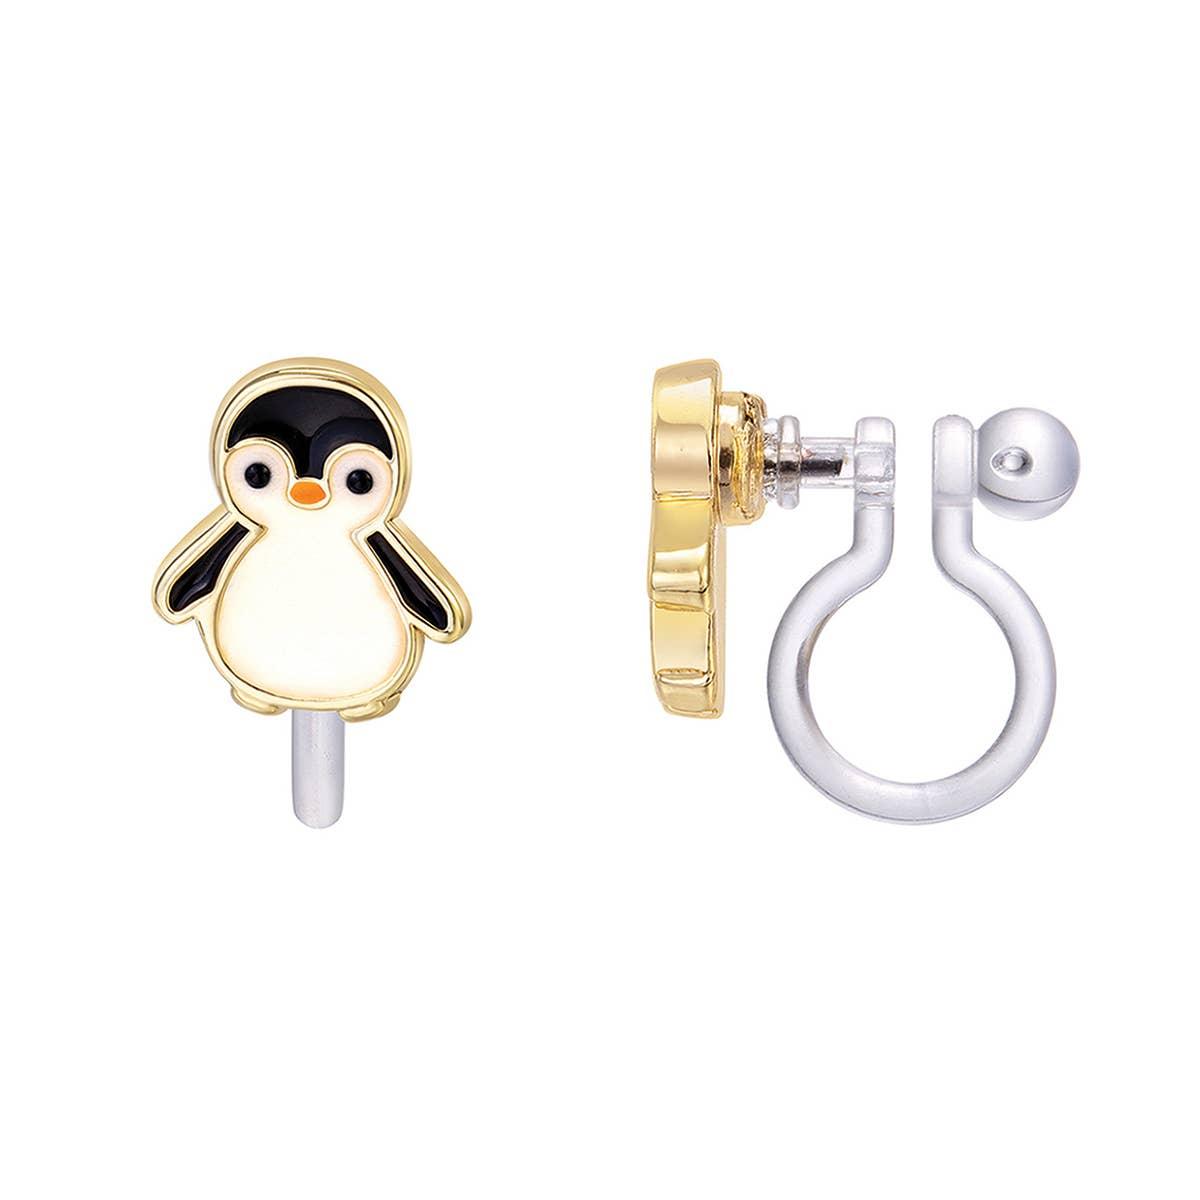 CLIP ON Cutie Earrings- Personable Penguin   Trada Marketplace